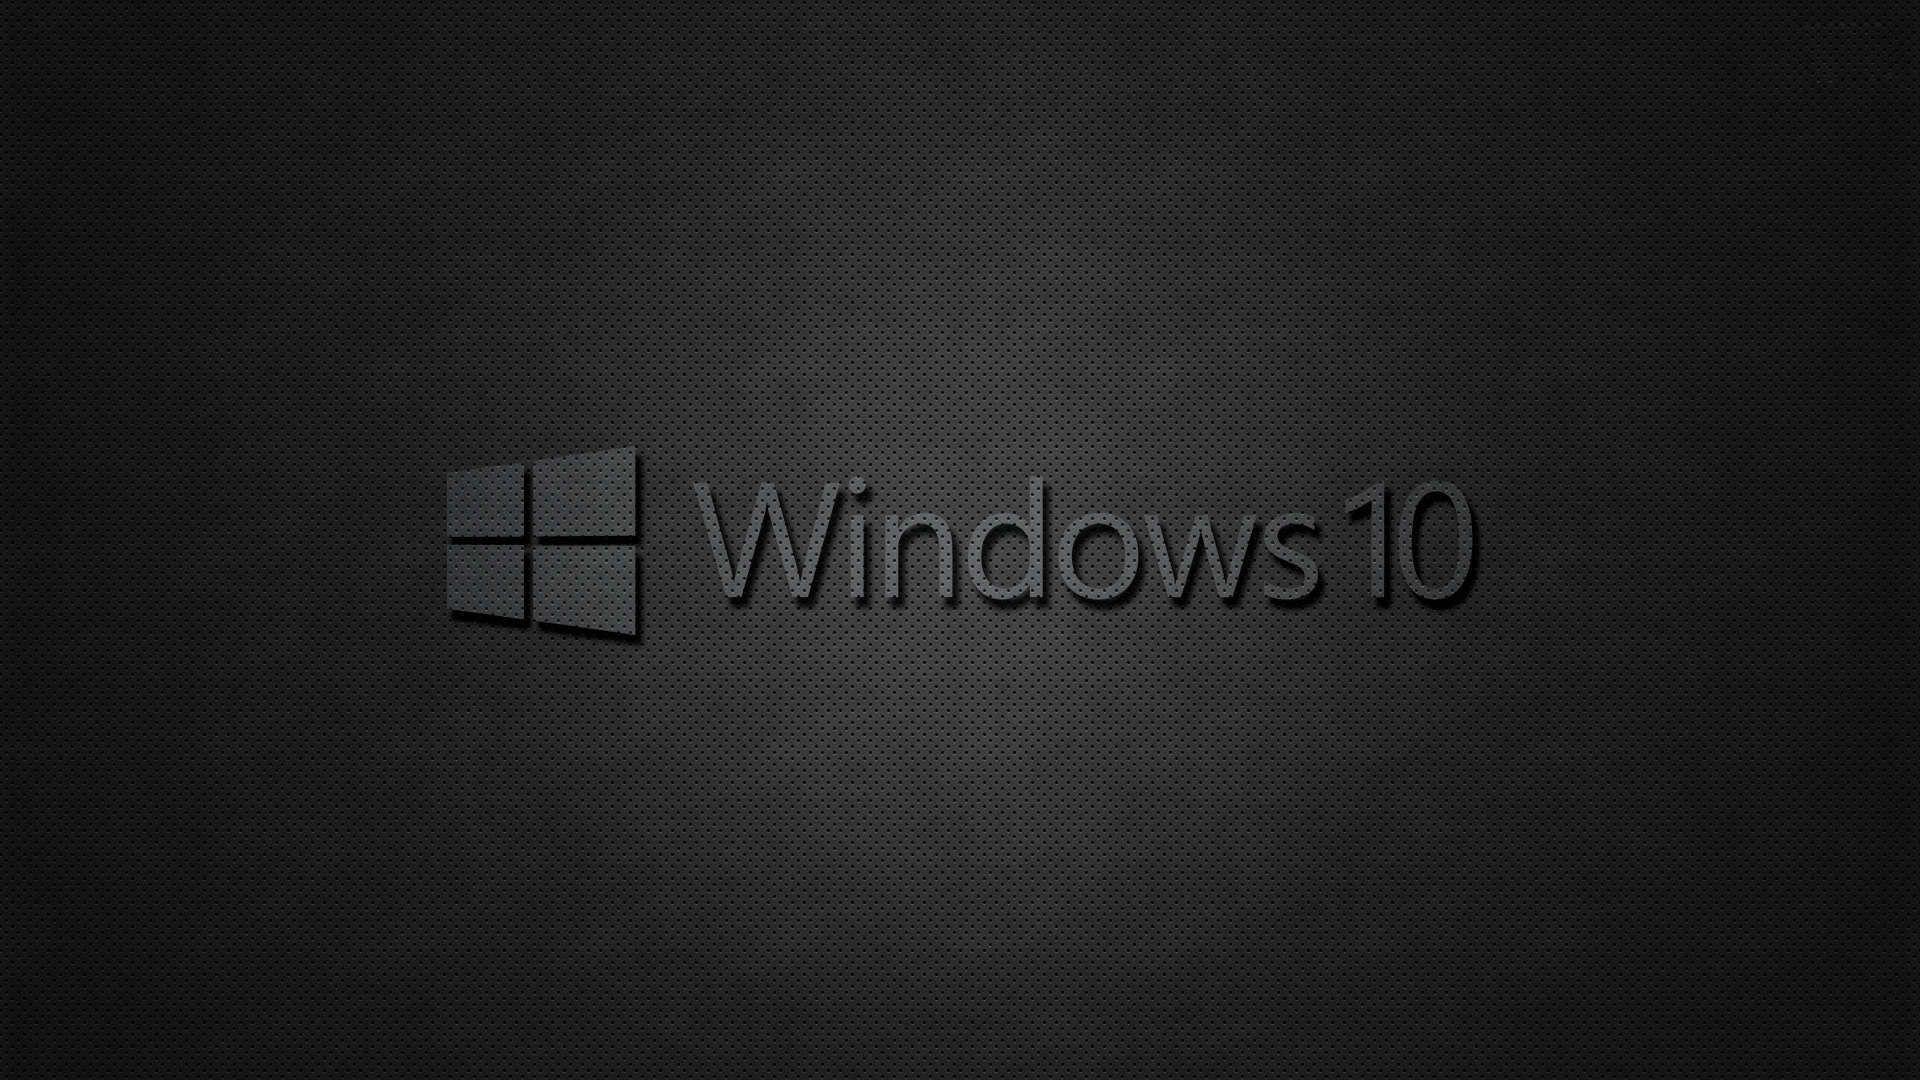 19201080 Black Windows 10 New Wallpaper Wallpaper 4k 4k In 2020 Wallpaper Windows 10 Windows 10 Windows Wallpaper